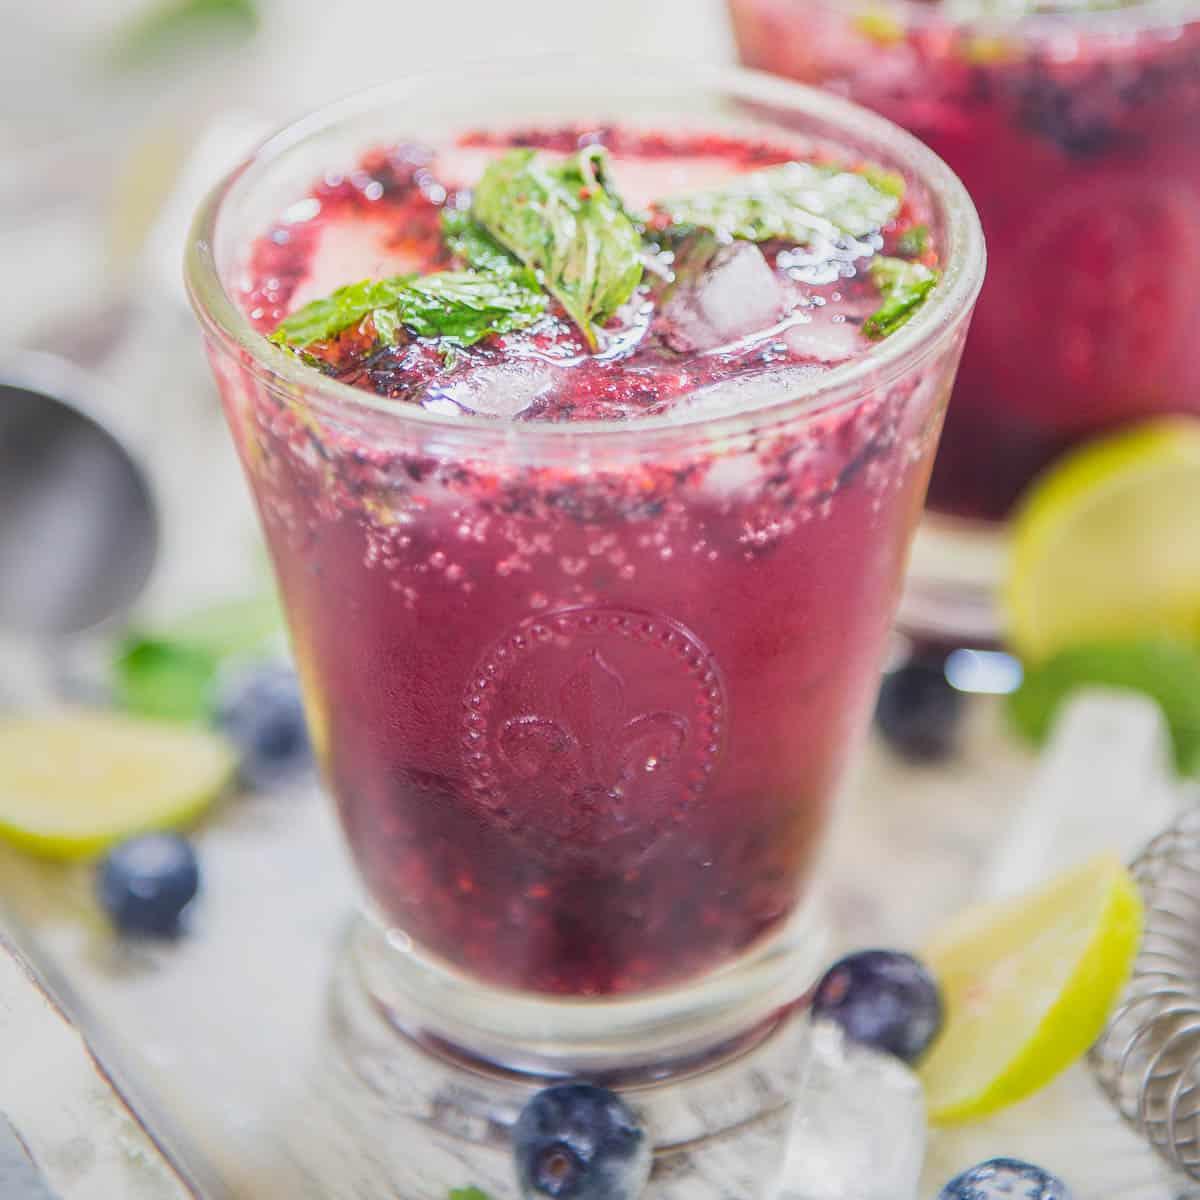 Mojito Zen Ricetta.Blueberry Mojito Recipe Step By Step Video Whiskaffair